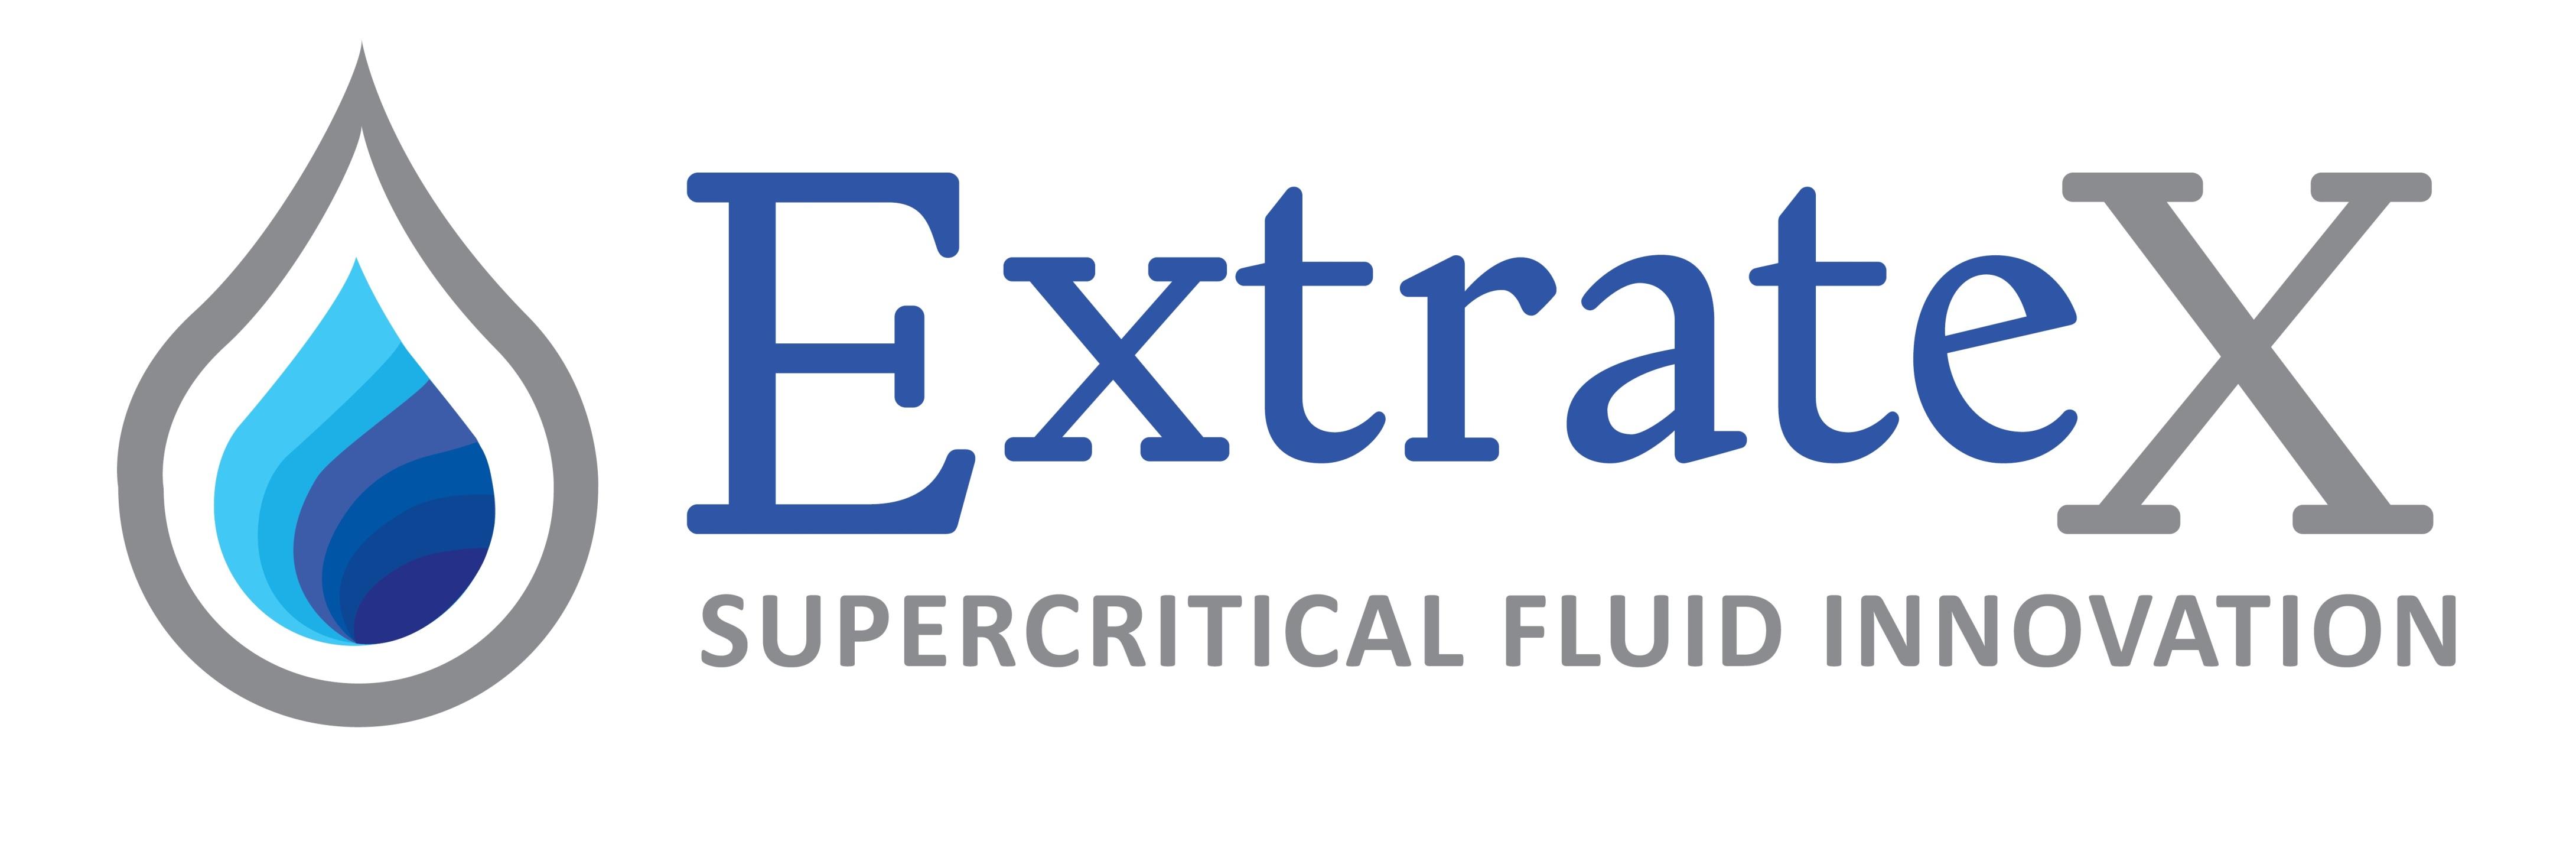 ExtrateX